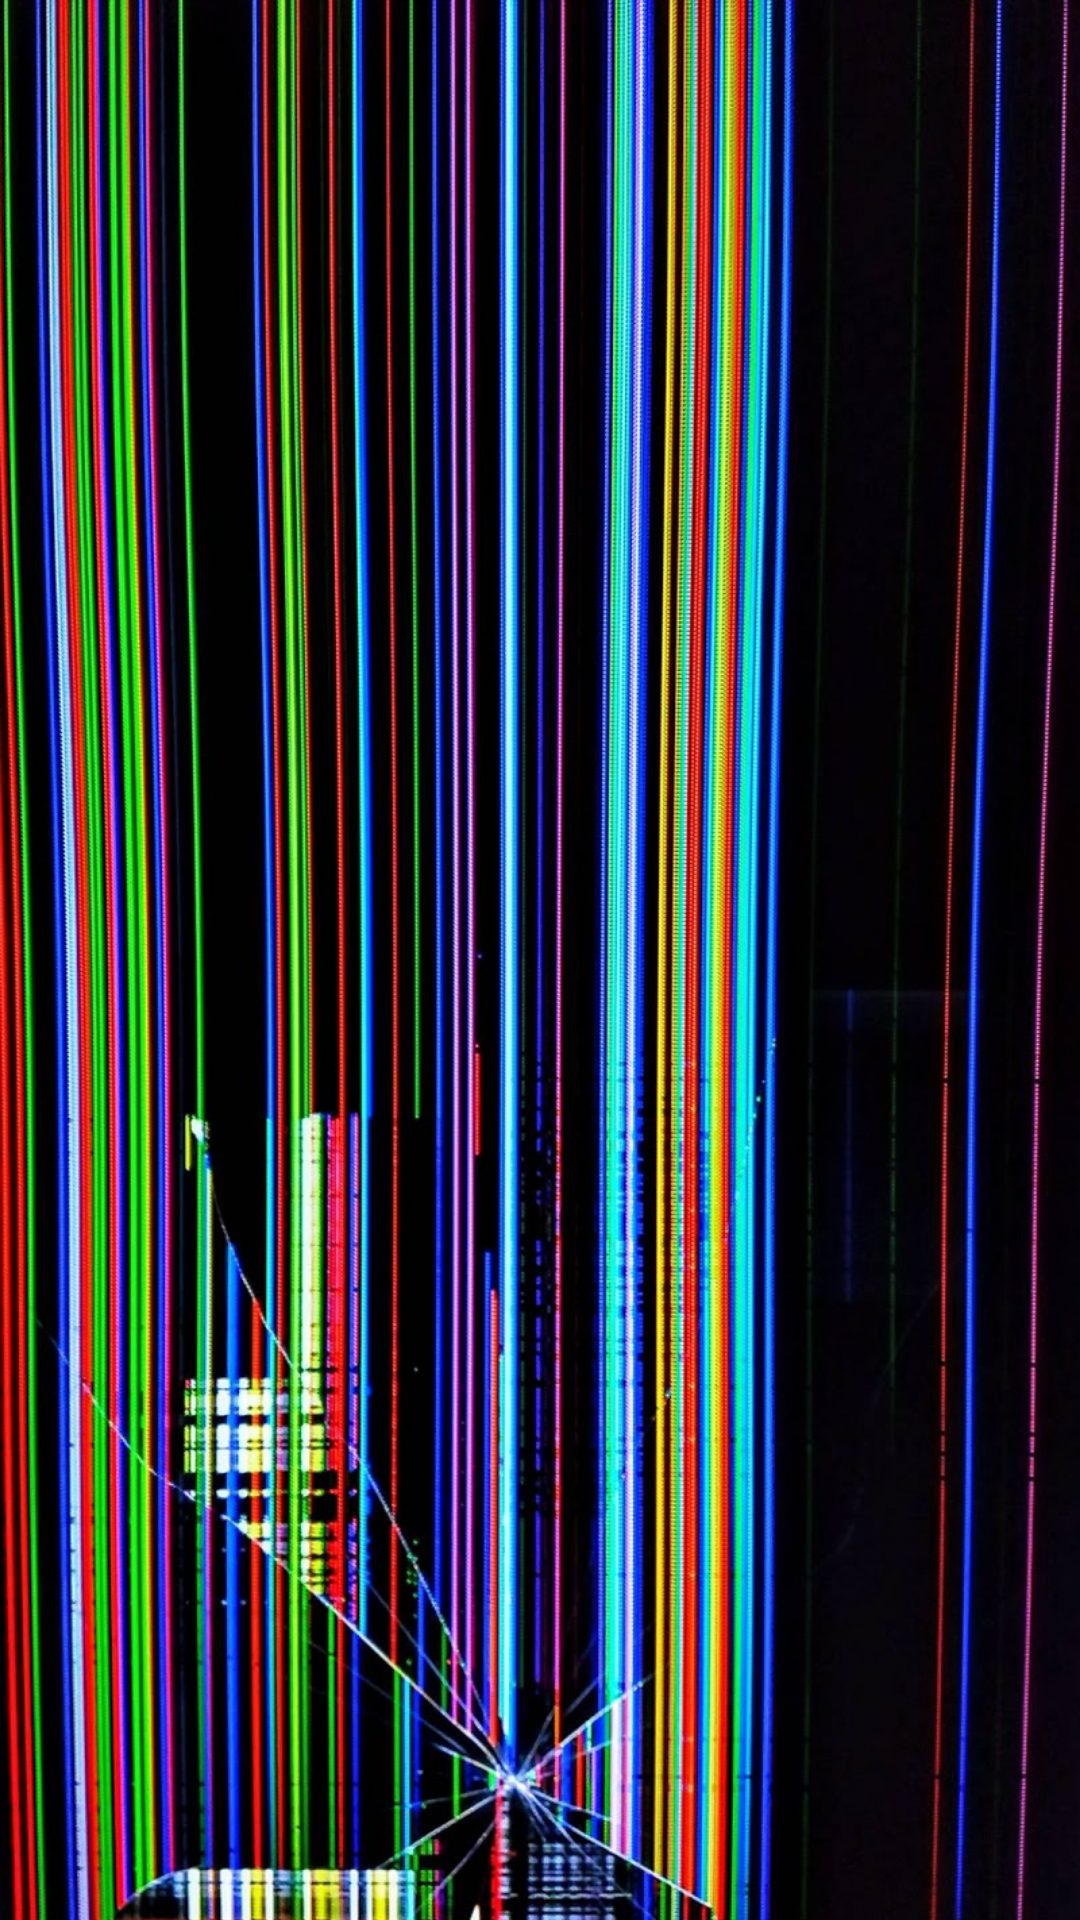 Ready for some Pranks? in 2020 Broken screen wallpaper